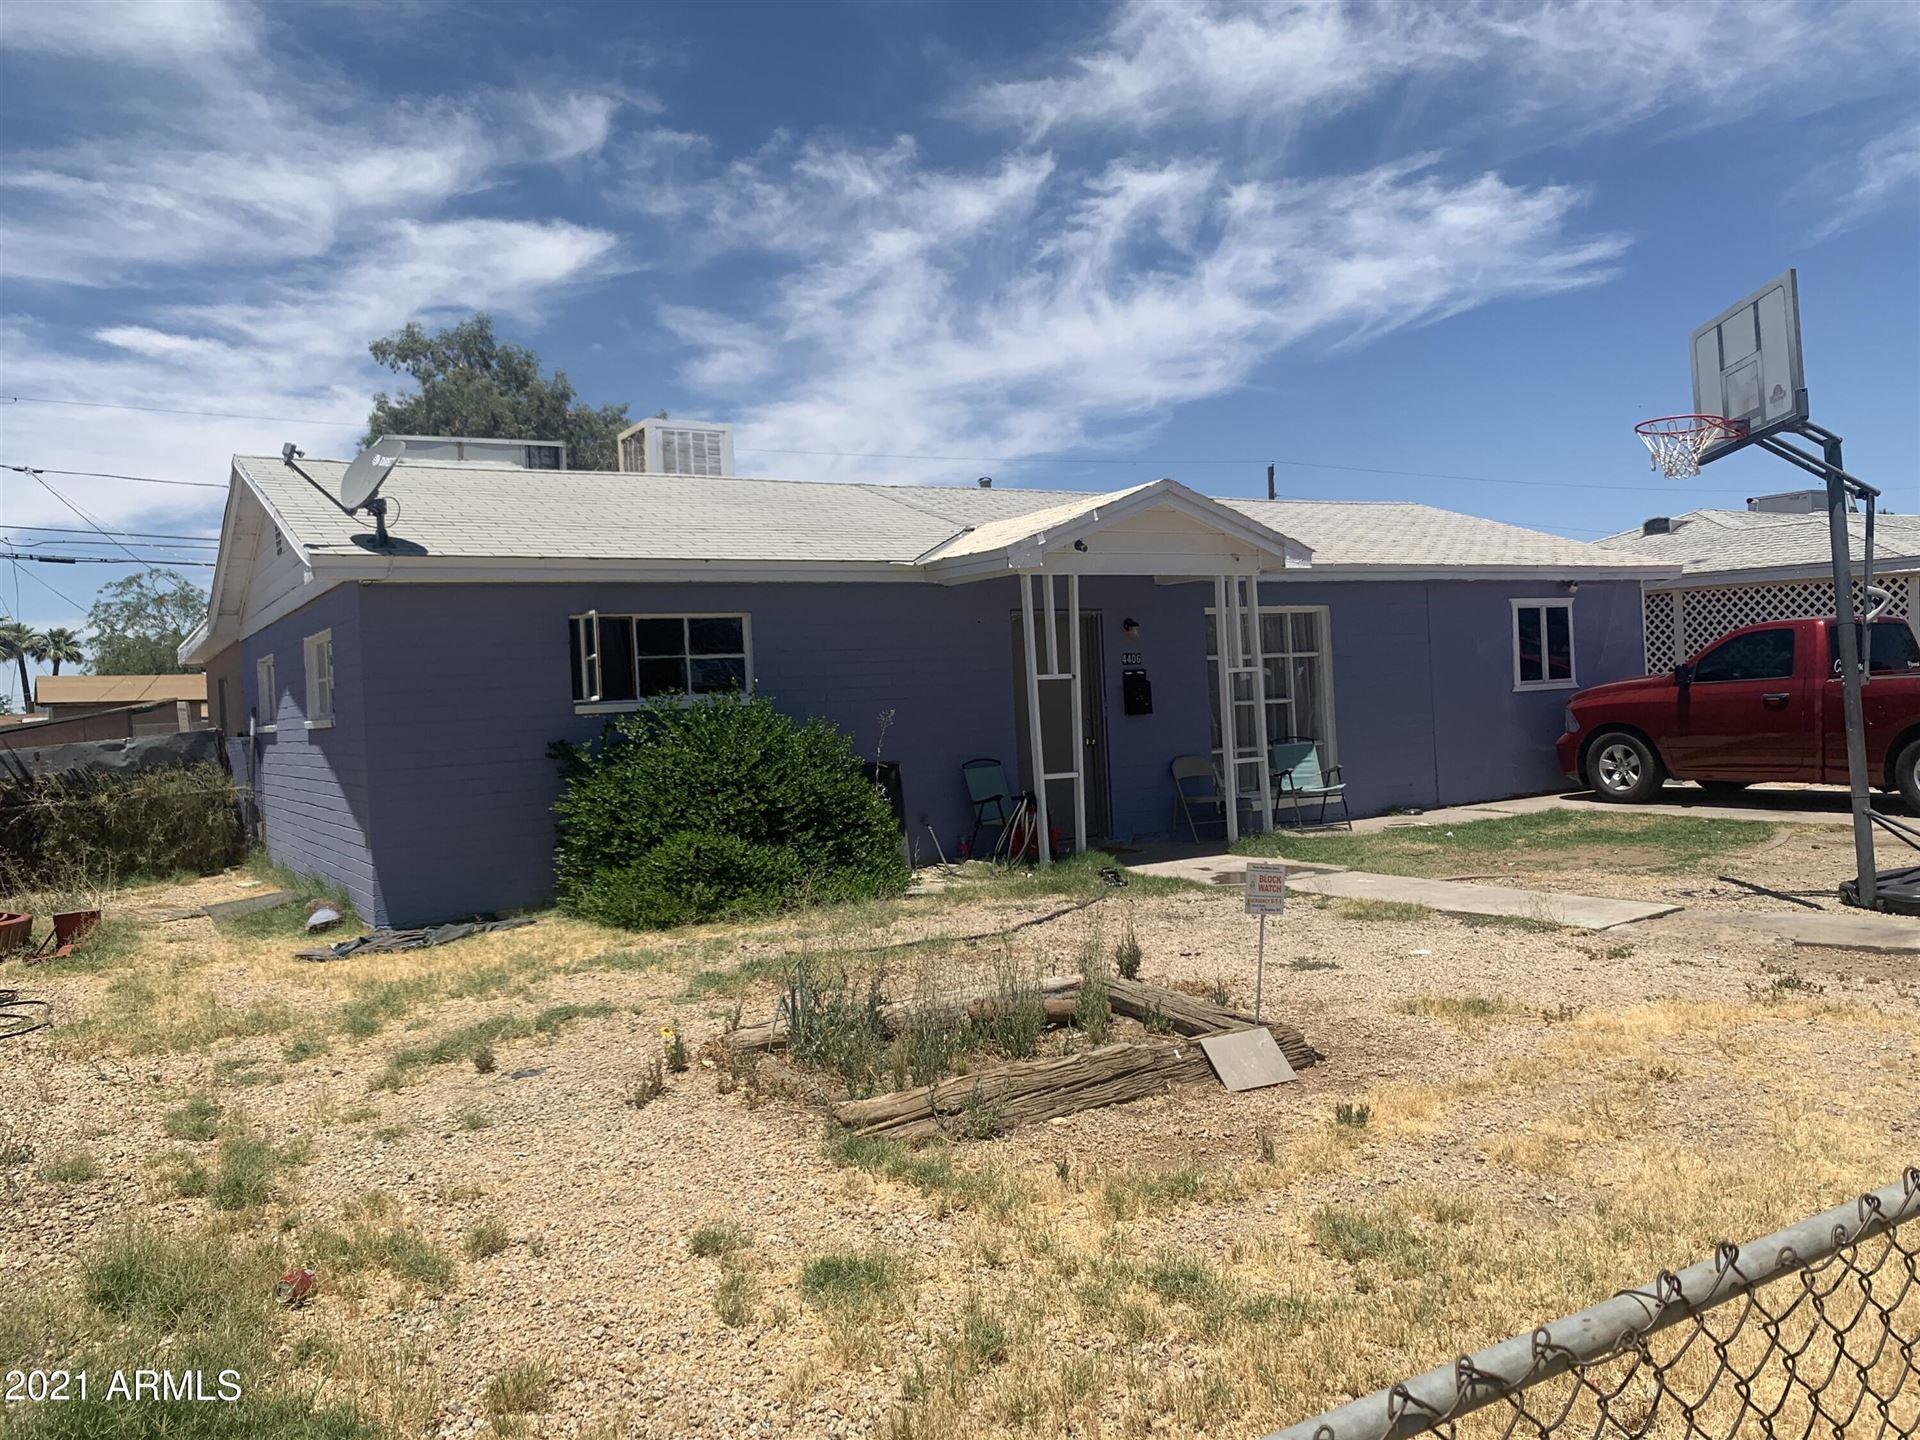 4406 N 30 Drive, Phoenix, AZ 85017 - MLS#: 6248254